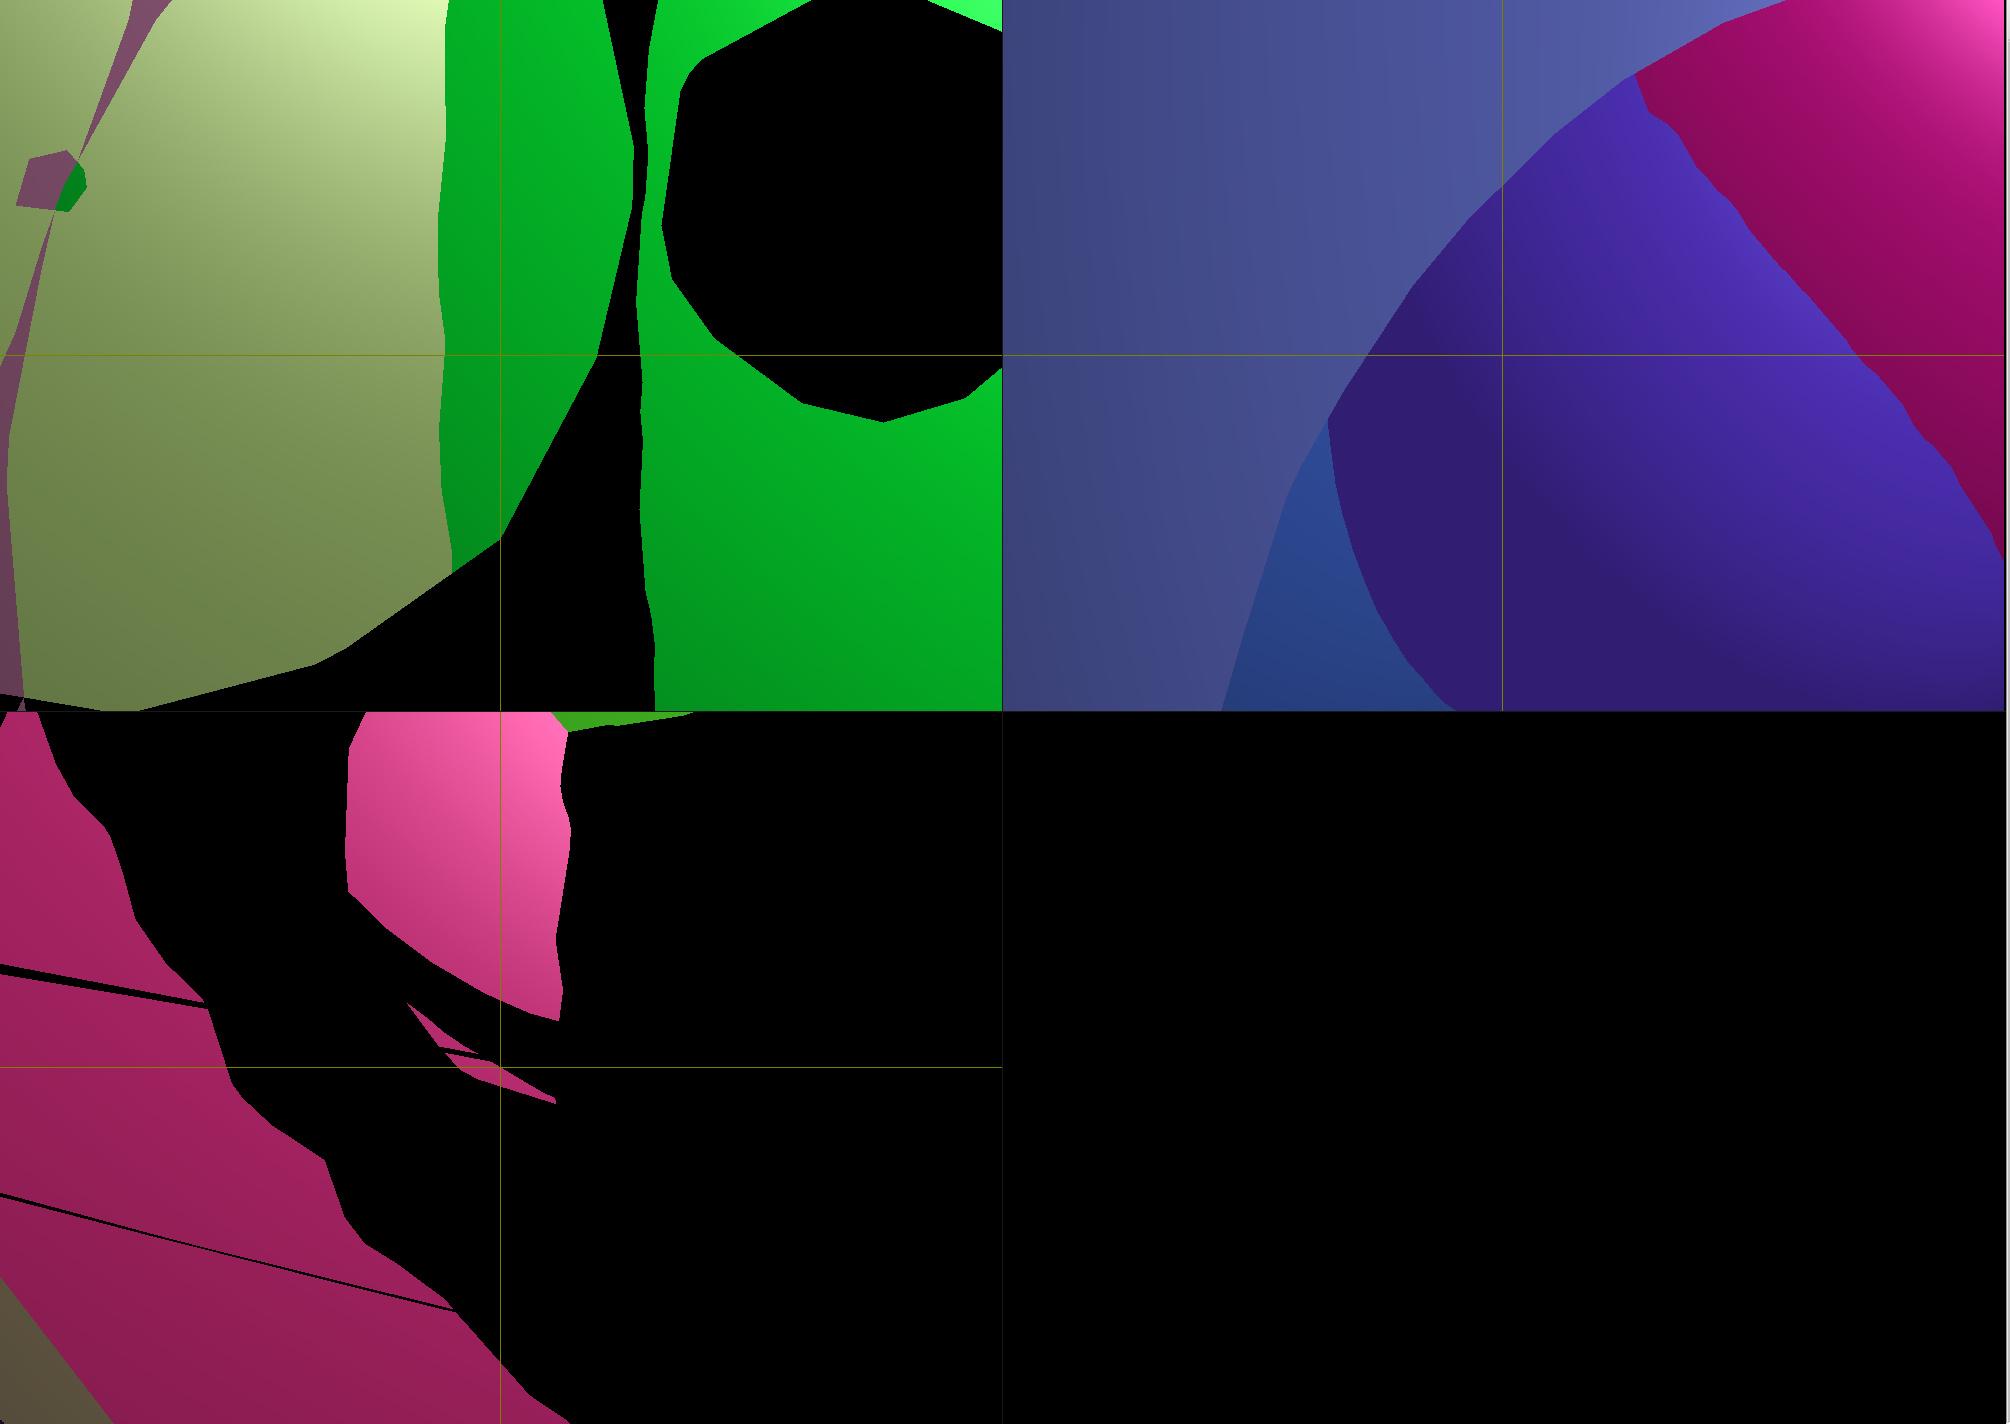 Tensor visualisation - MRtrix3 Community